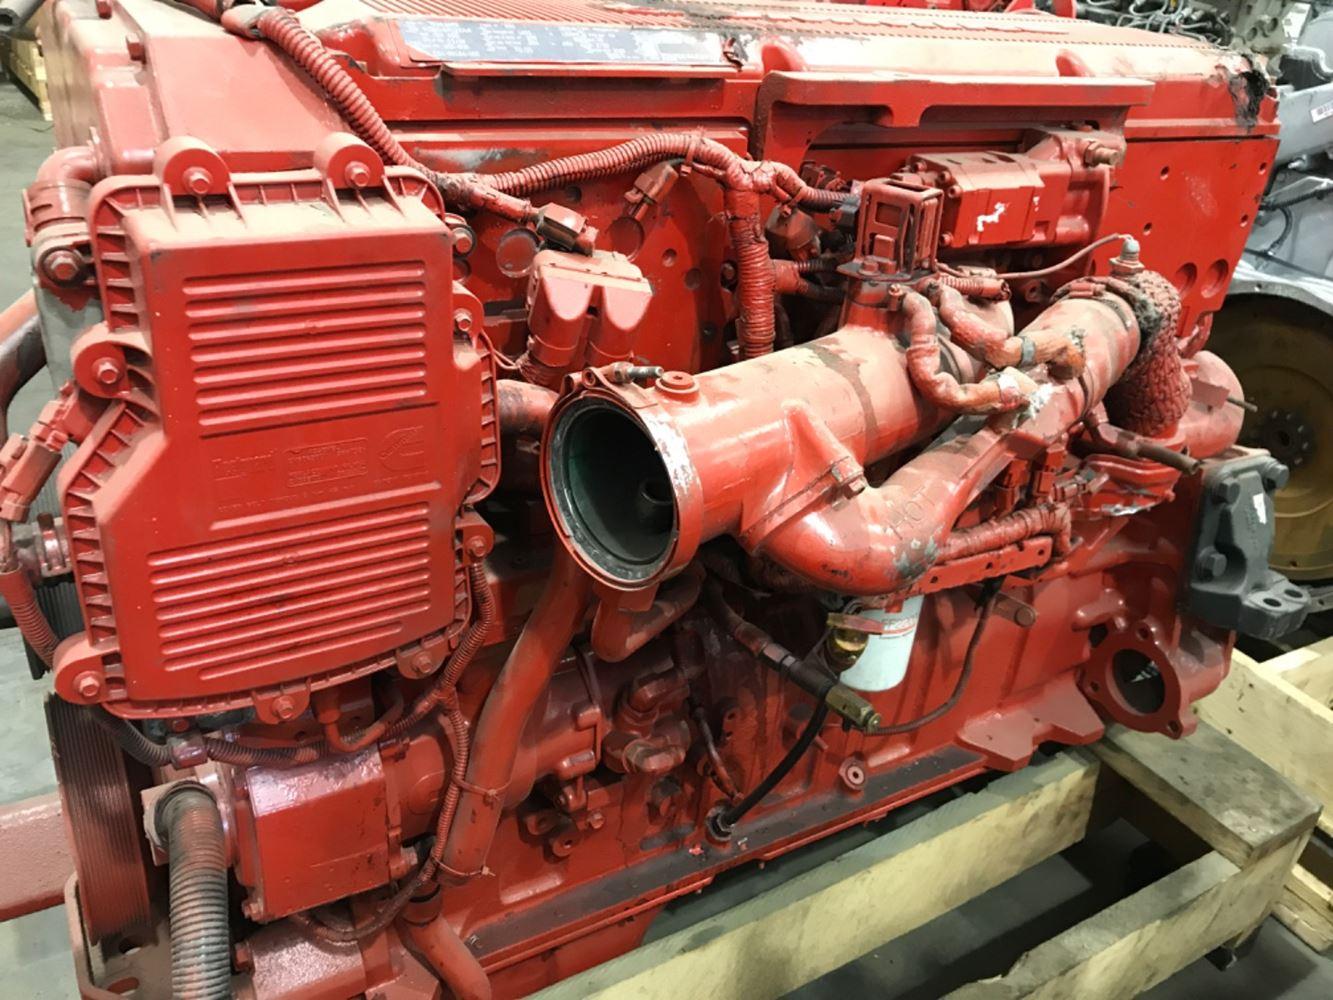 2010 CUMMINS ISX; SIGNATURE ENGINE ASSEMBLY TRUCK PARTS #679794